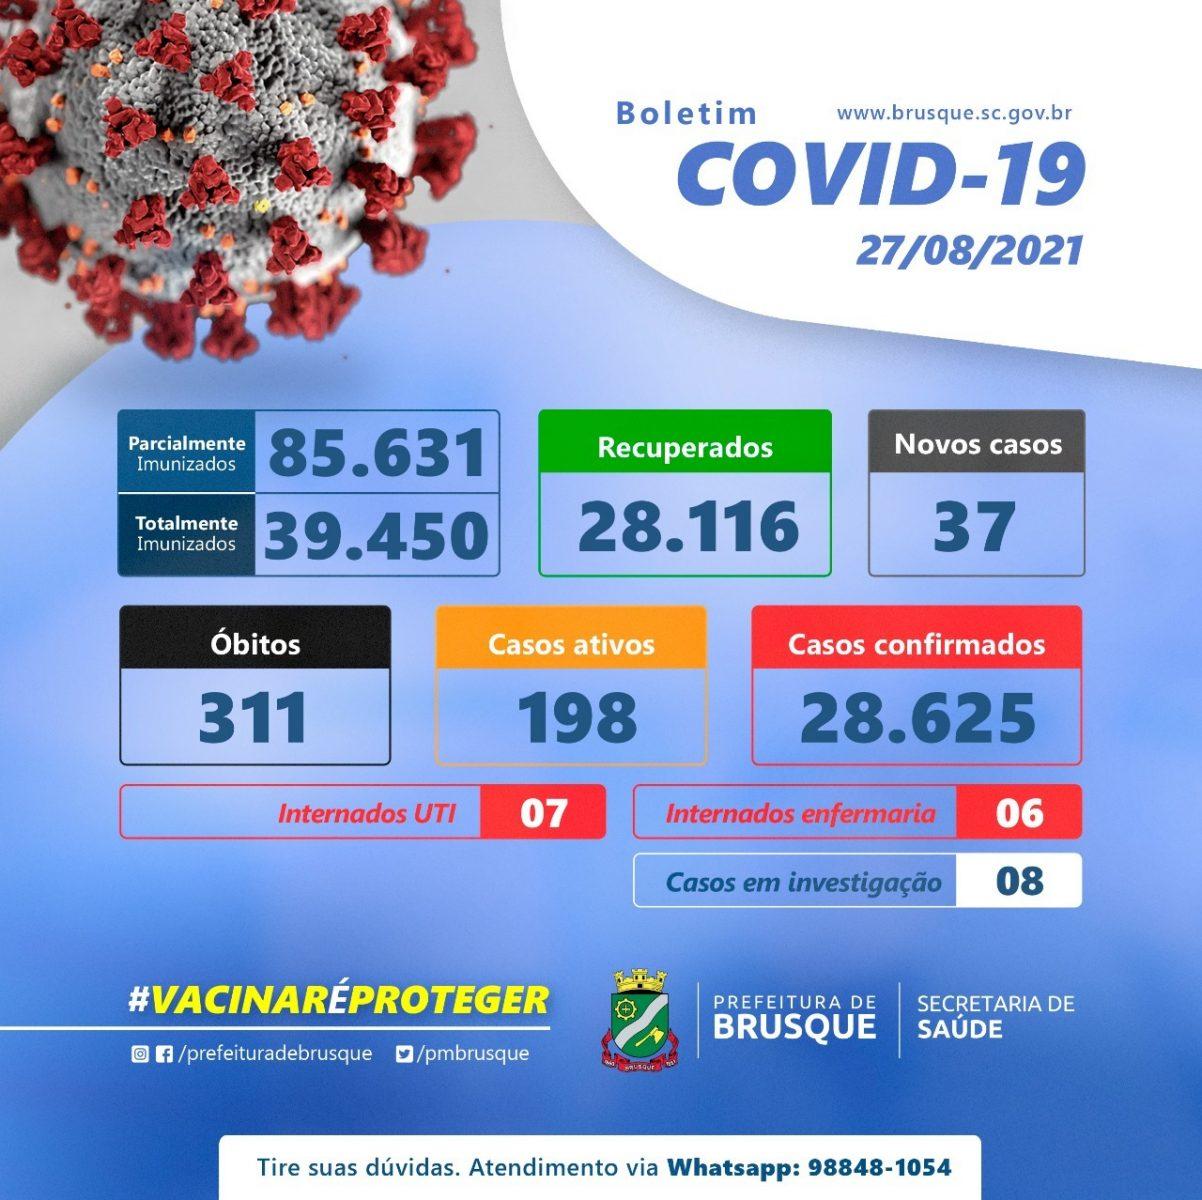 Covid-19: Confira o boletim epidemiológico desta sexta-feira (27)